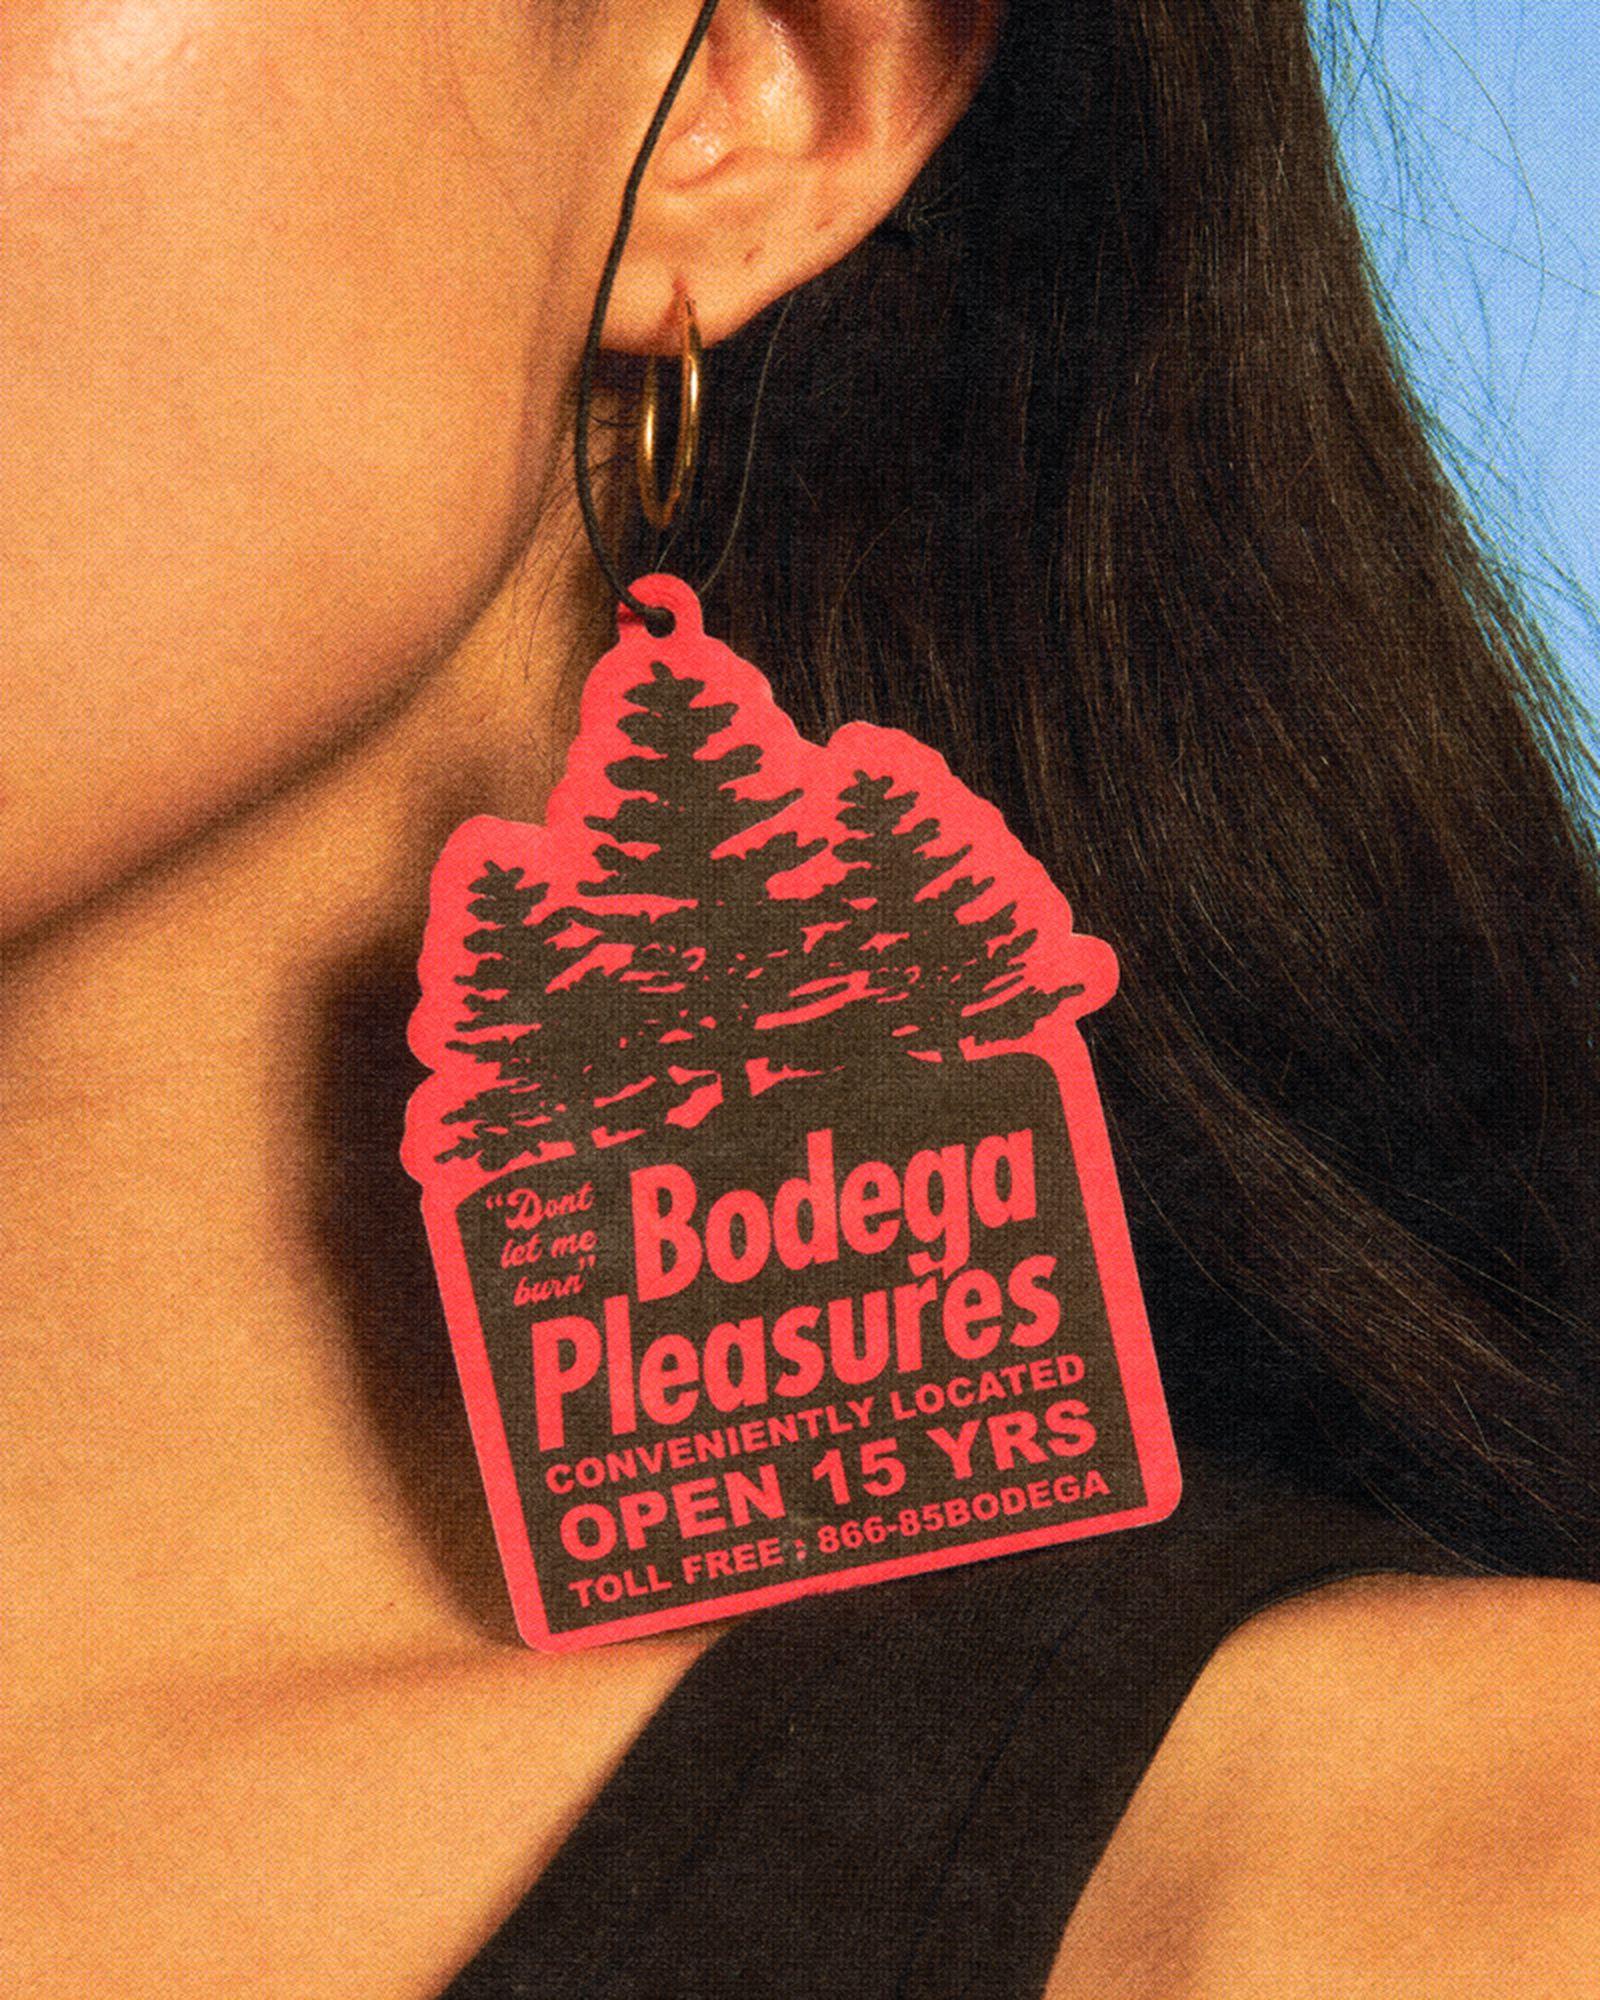 bodega-pleasures-anniversary-capsule-collection-3